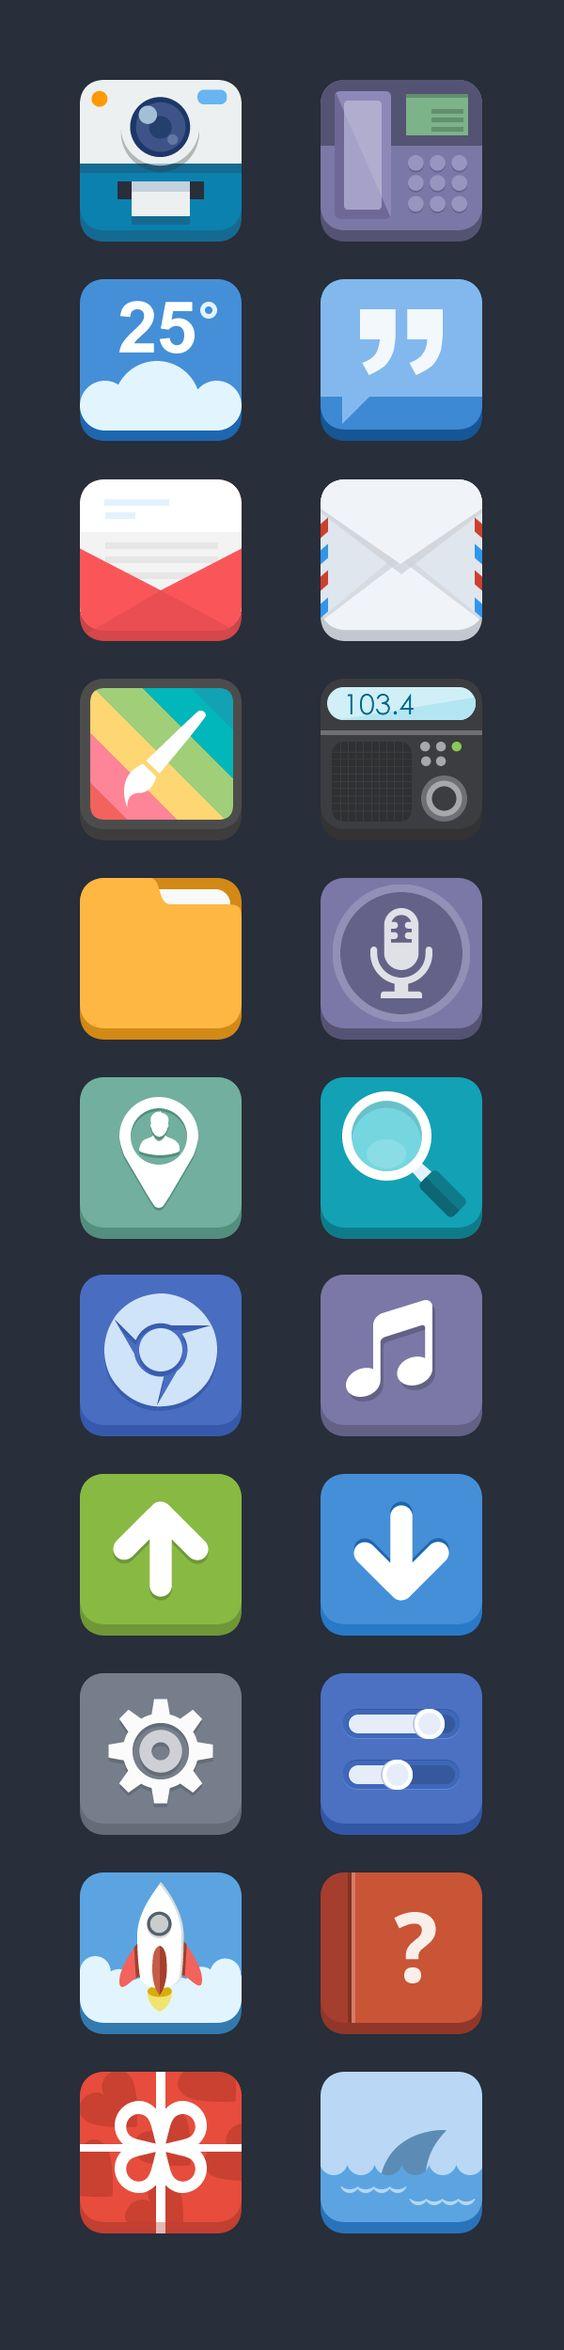 3D Flat Icons 2 by Blues design, via Behance                              …